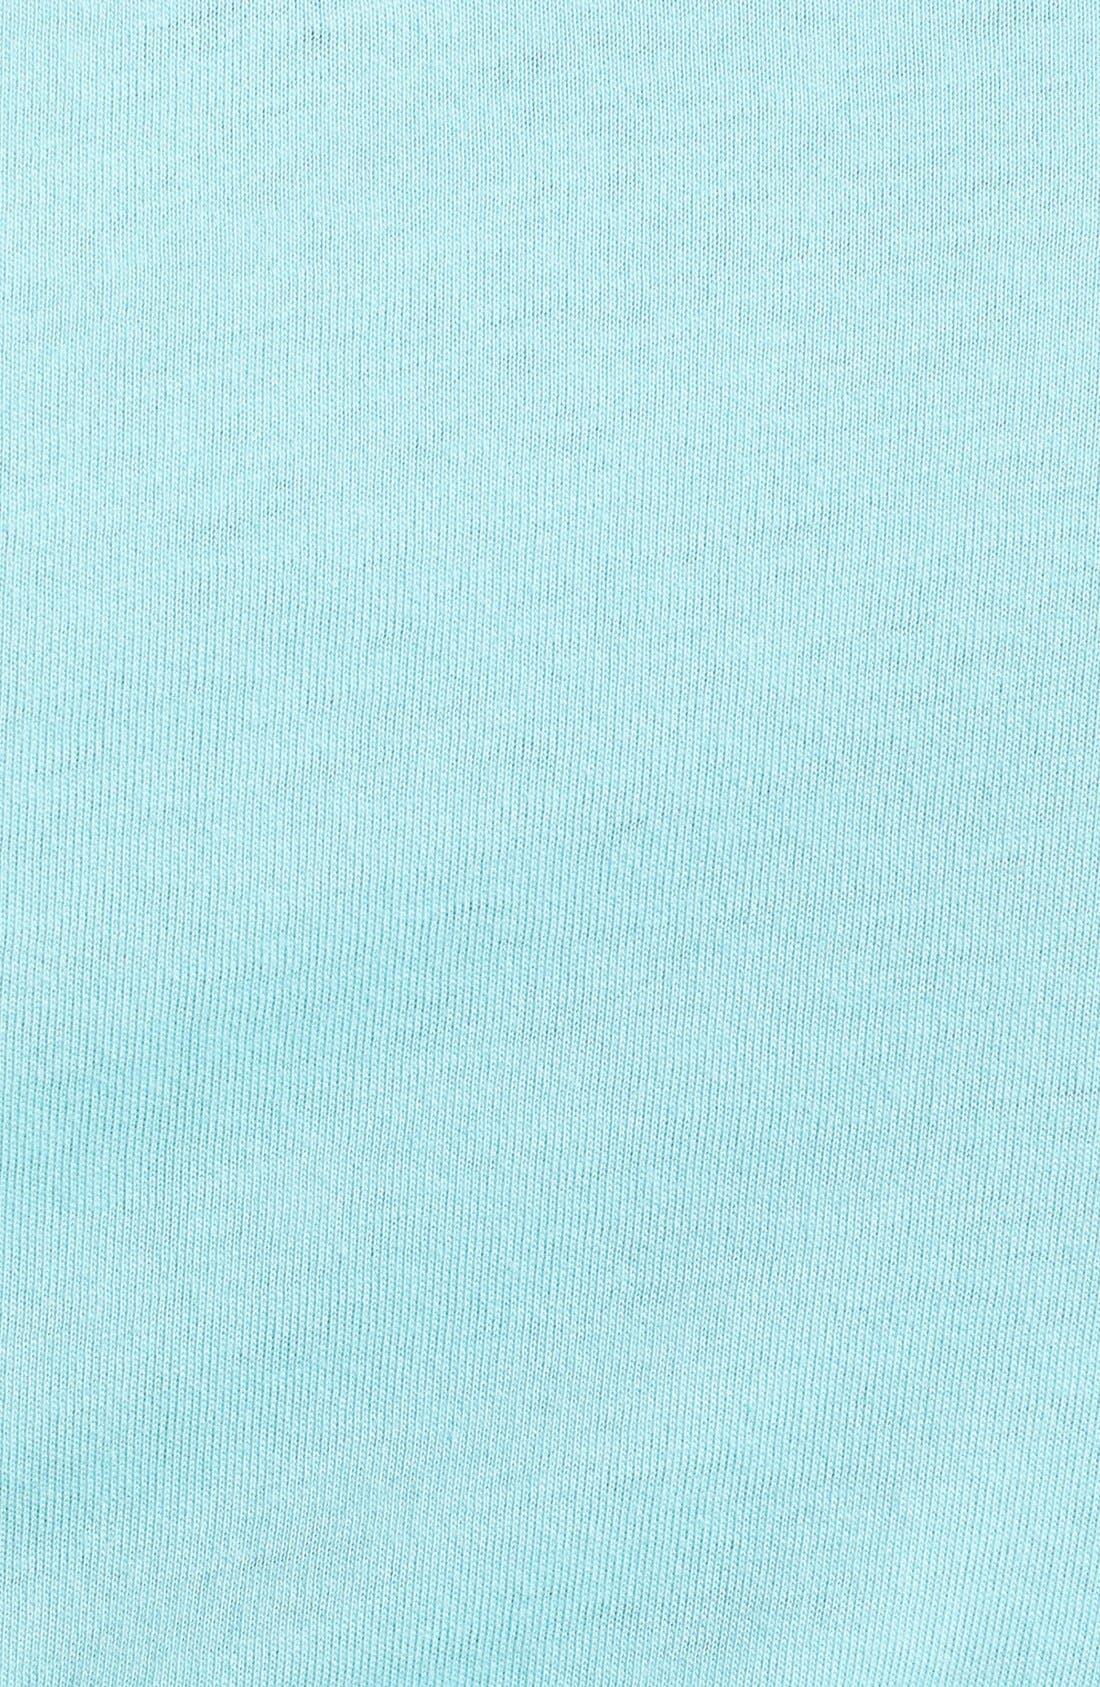 Knit Pajamas,                             Alternate thumbnail 31, color,